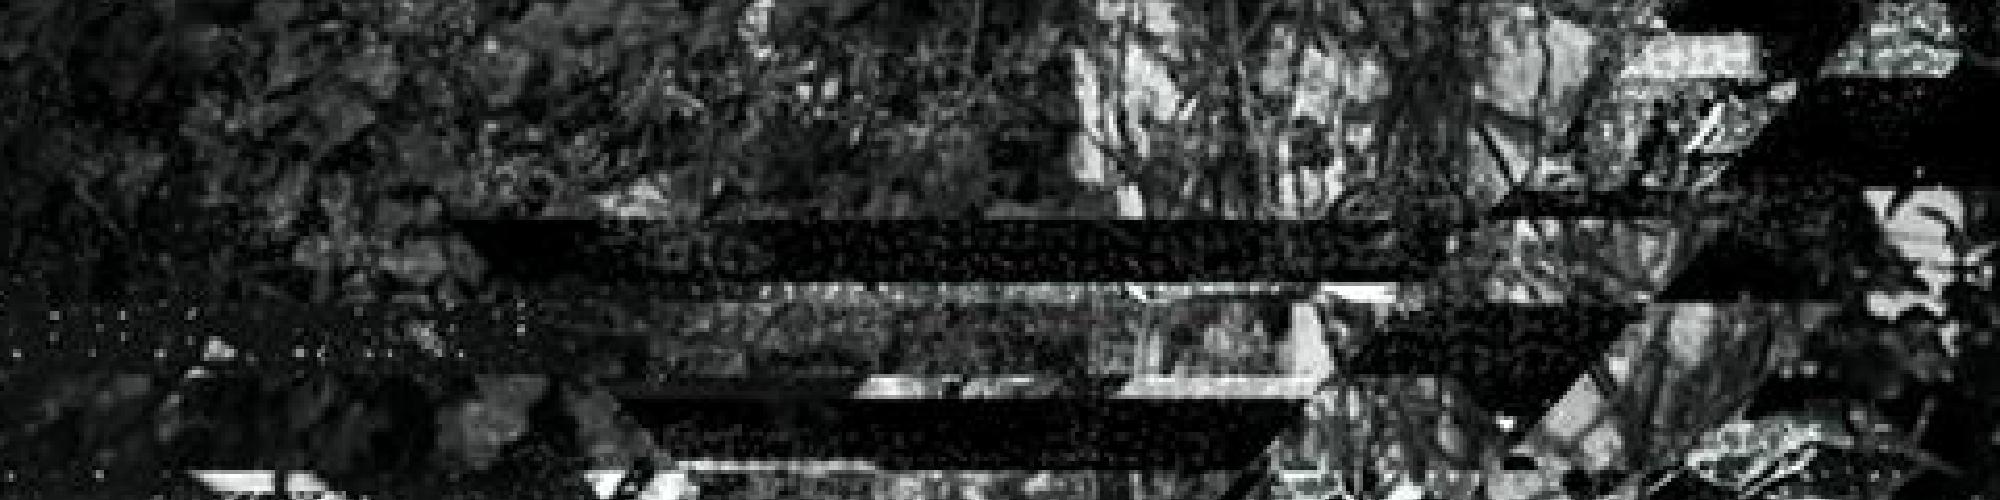 2009-shigeto-textures-banner.jpg